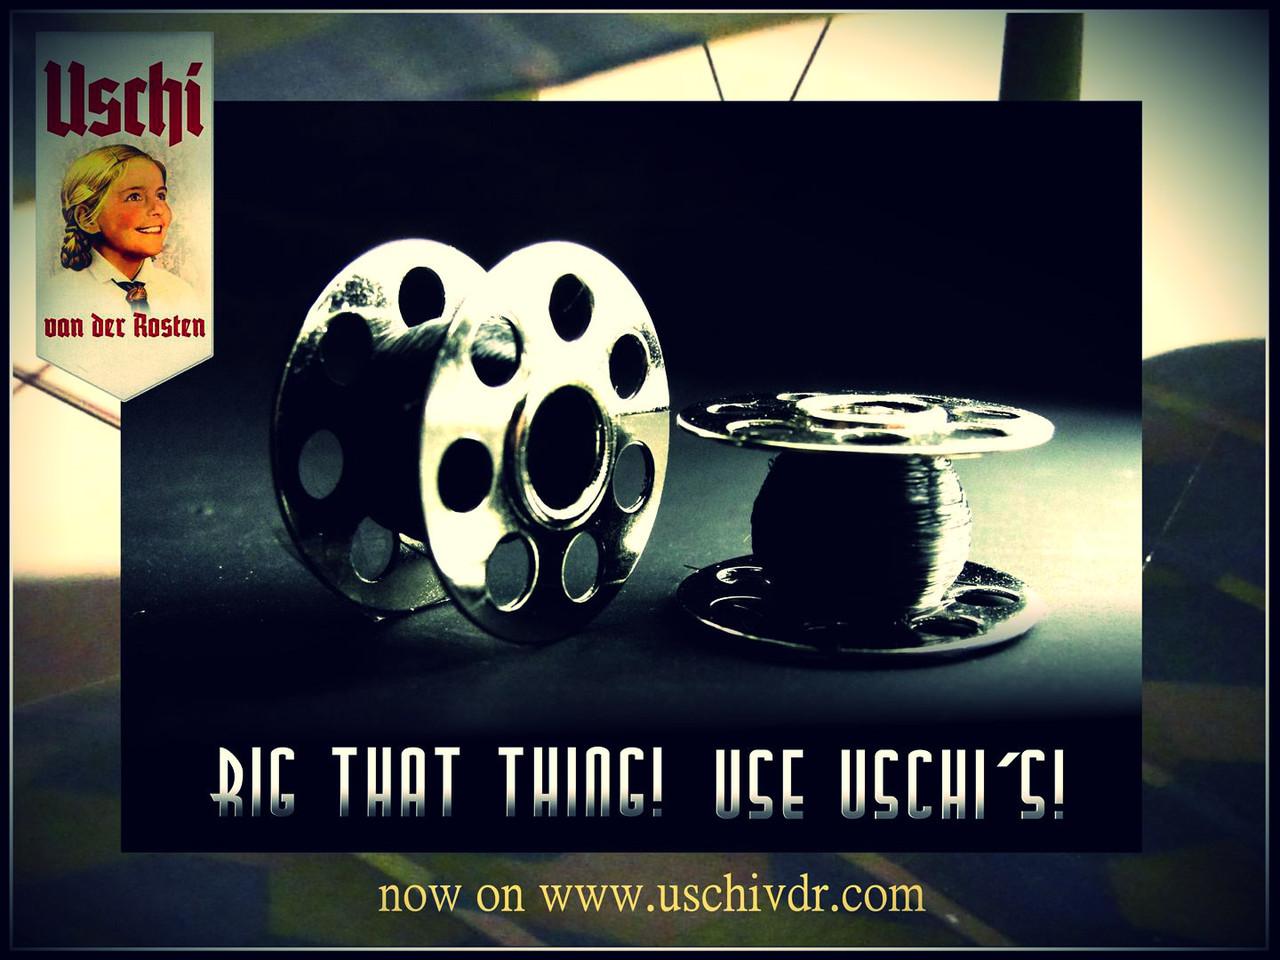 www.uschivdr.com